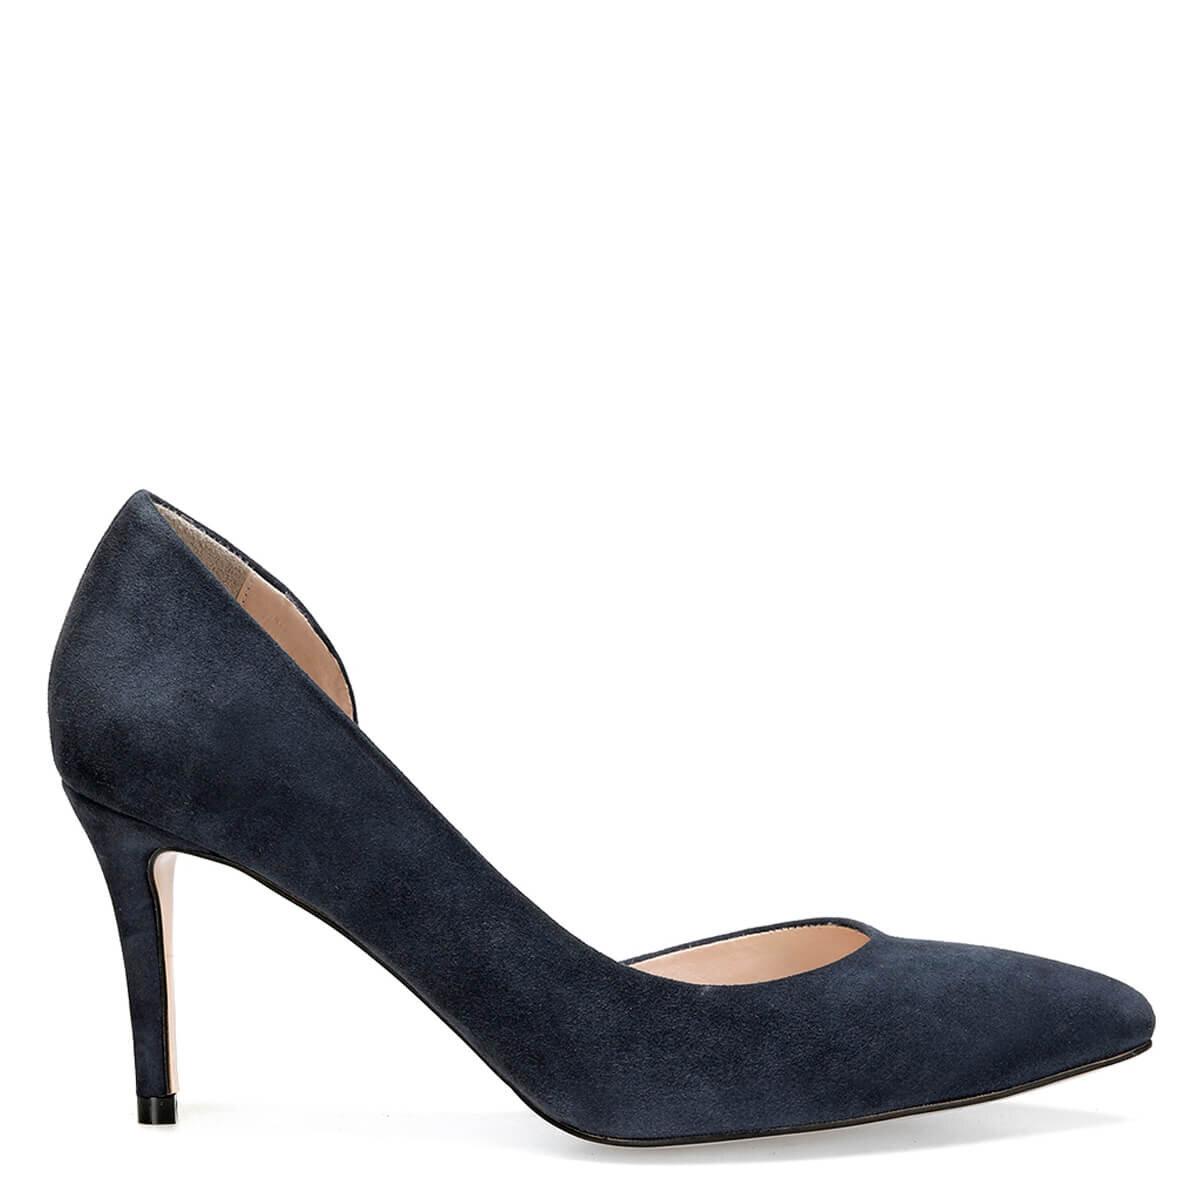 TIKKA Lacivert Kadın Topuklu Ayakkabı